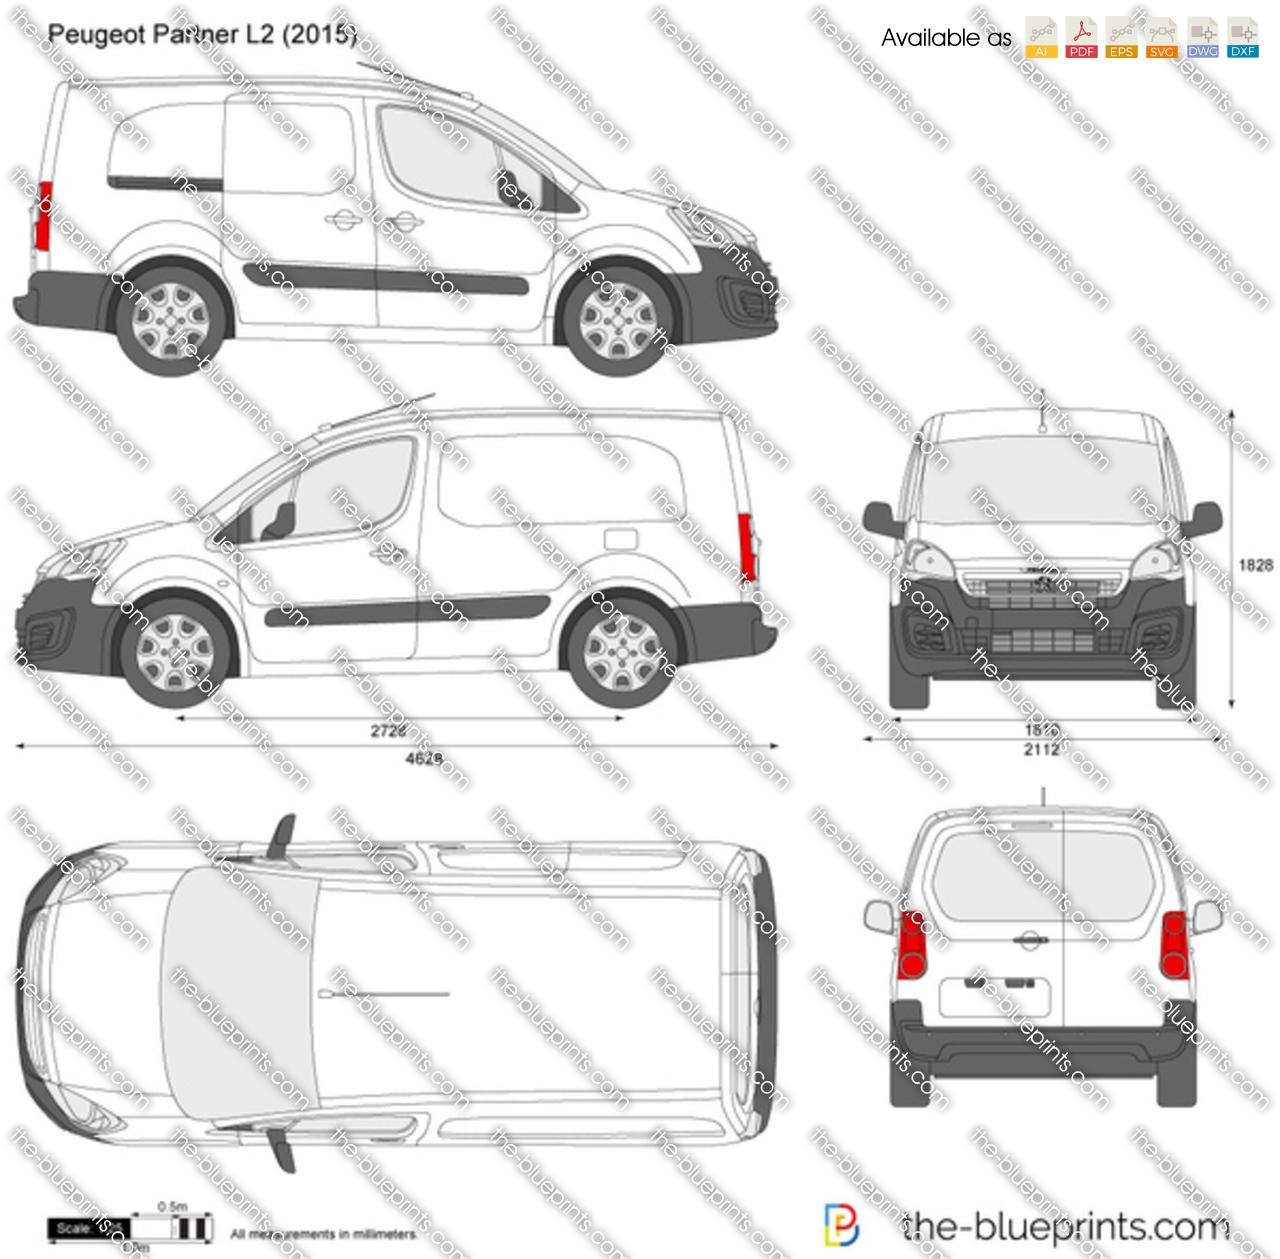 Peugeot Partner L2 2017